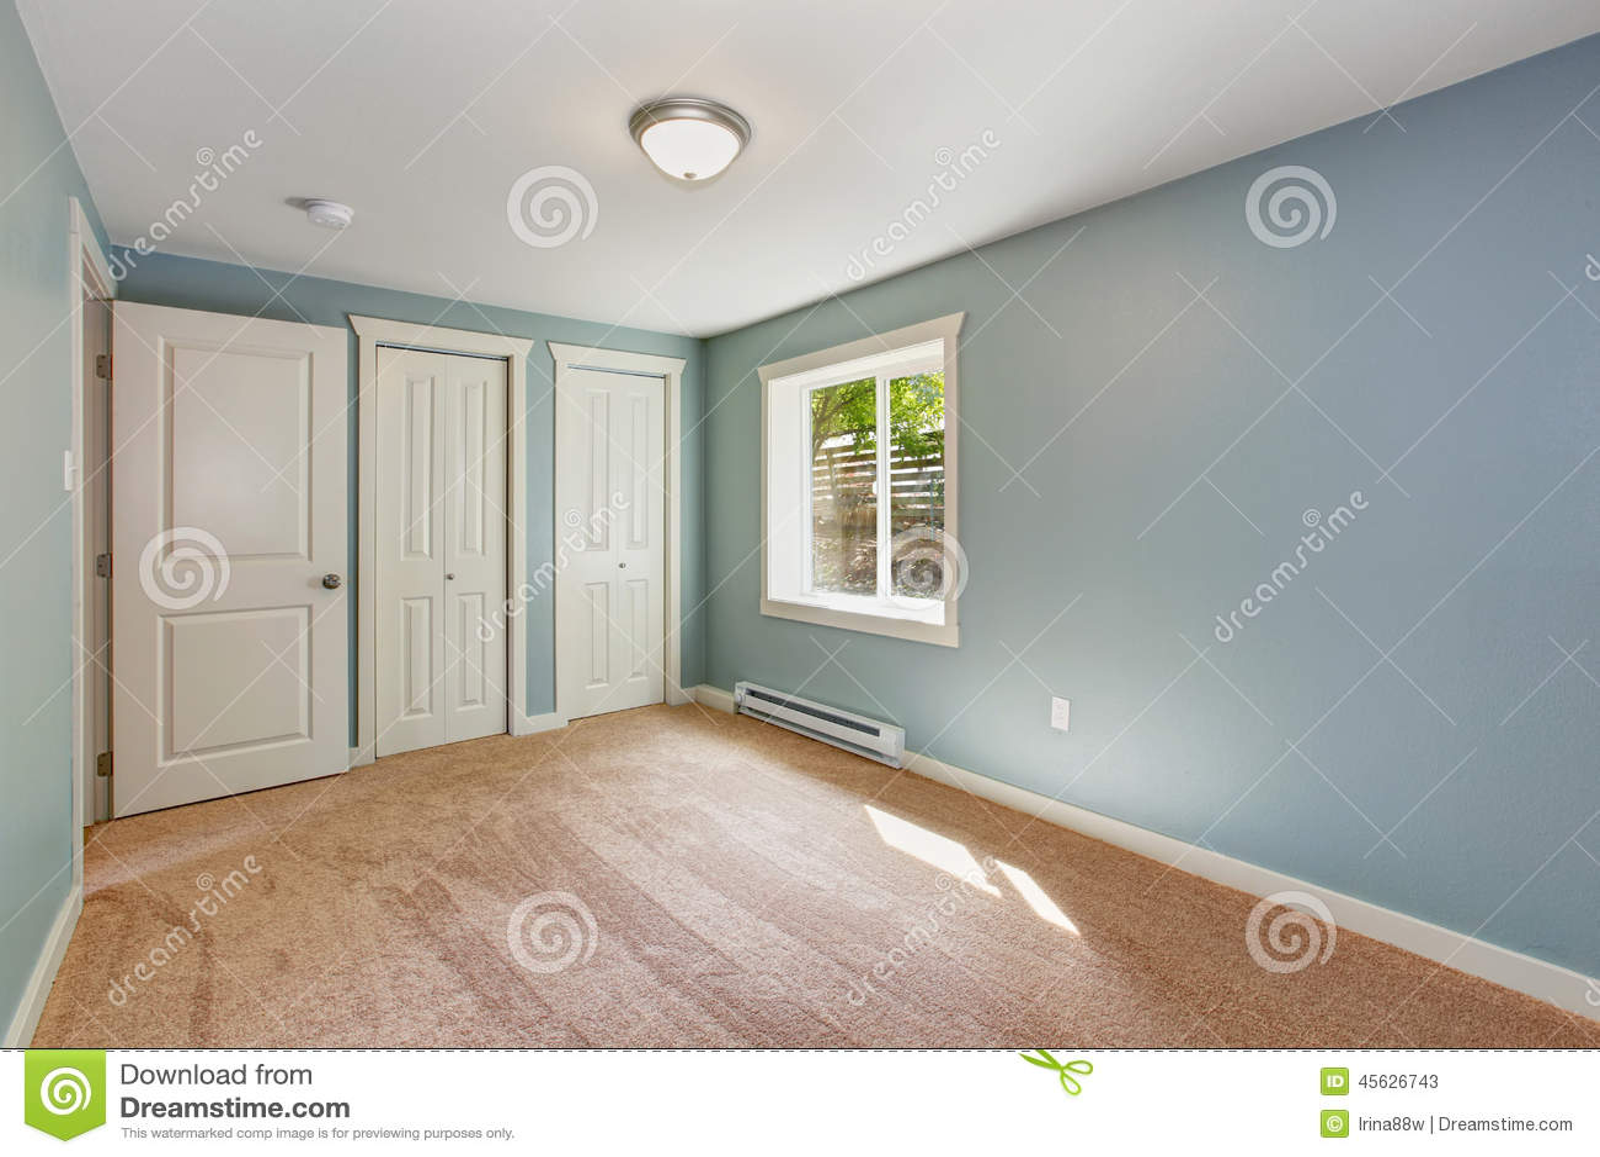 Litet ljus   blått sovrum i tomt hus arkivfoto   bild: 45626740